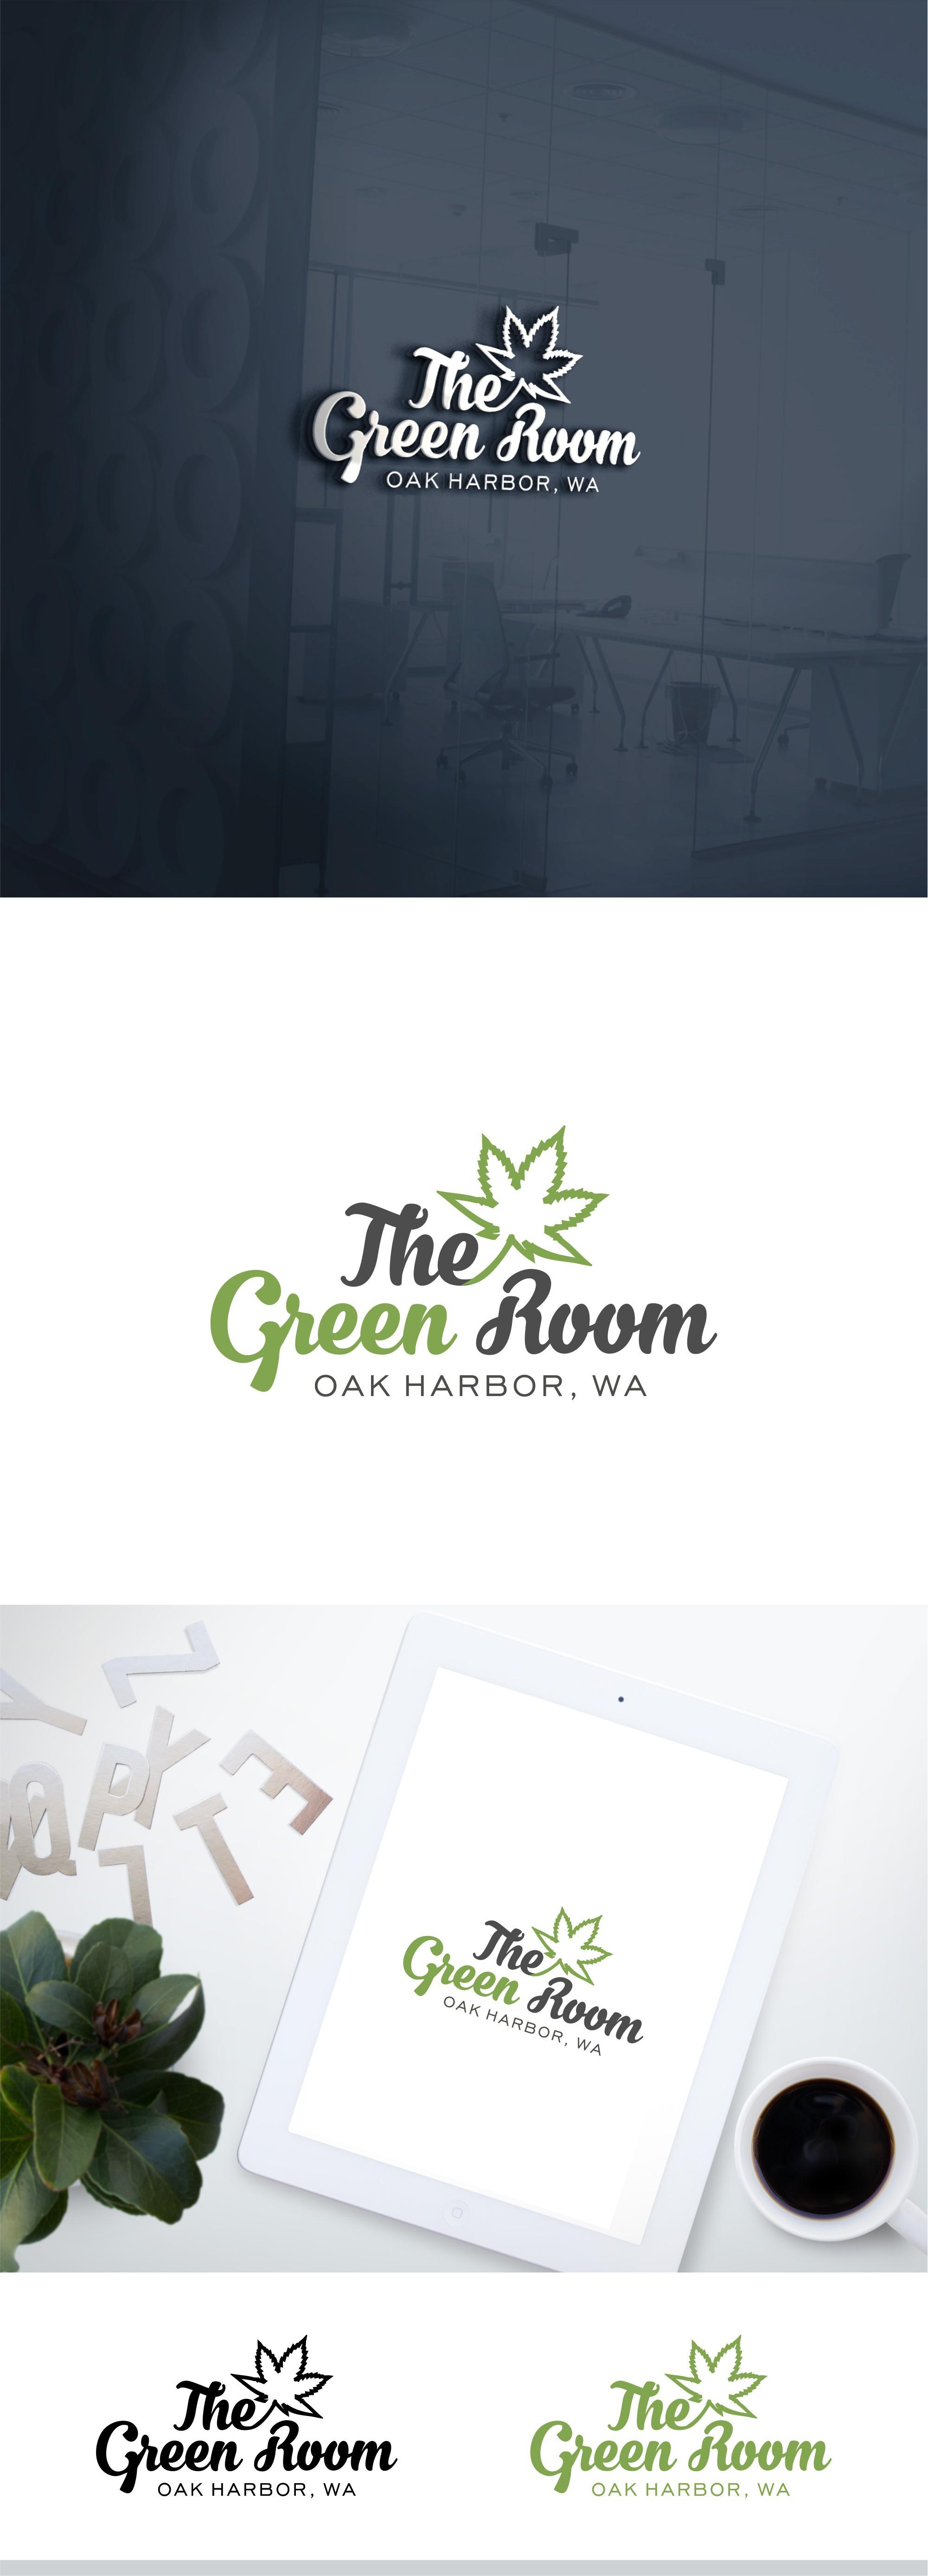 The Green Room Marijuana shop